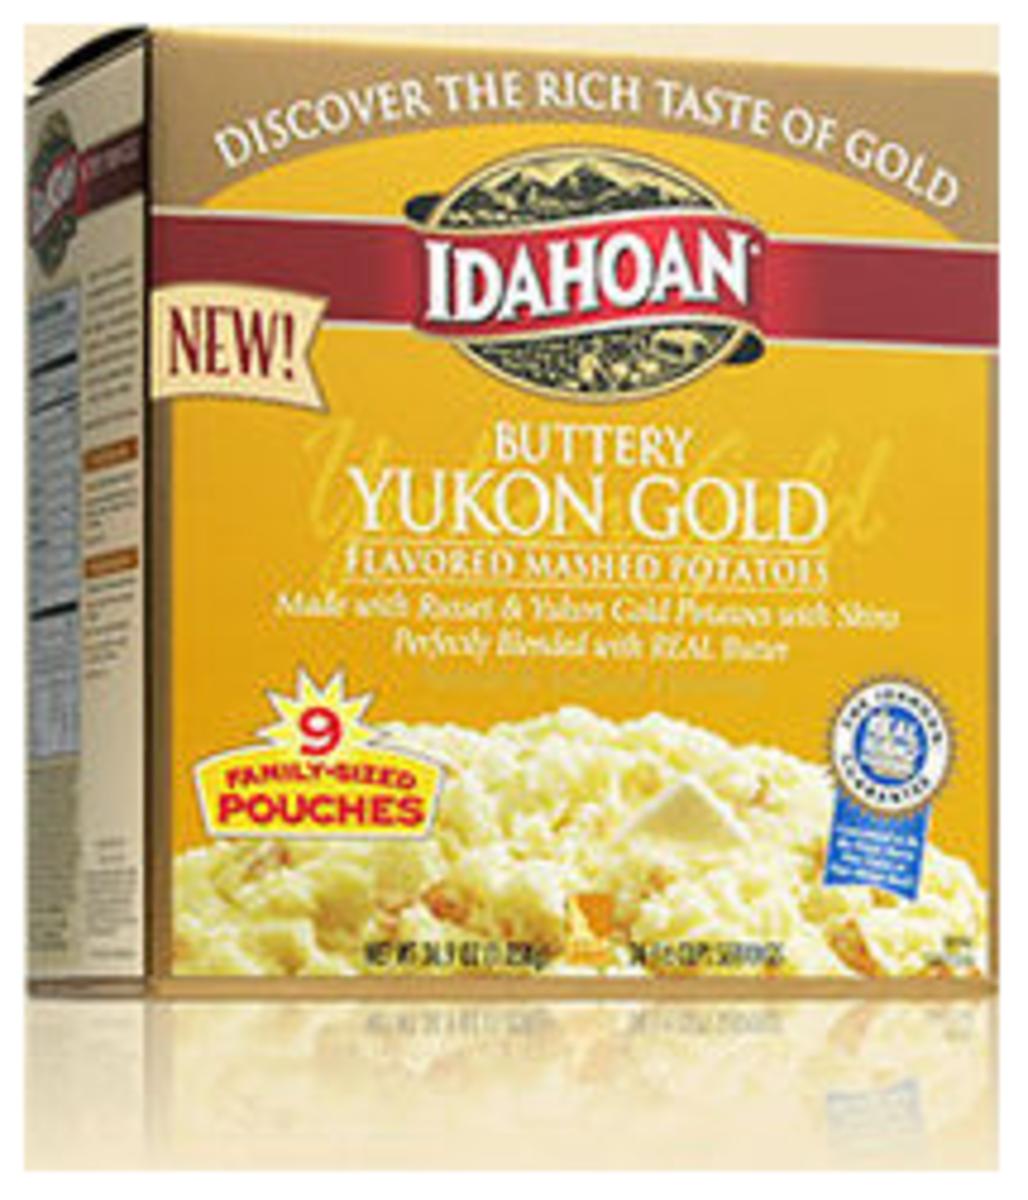 Easy Side Dishes - Yukon Gold Idahoan Potatoes